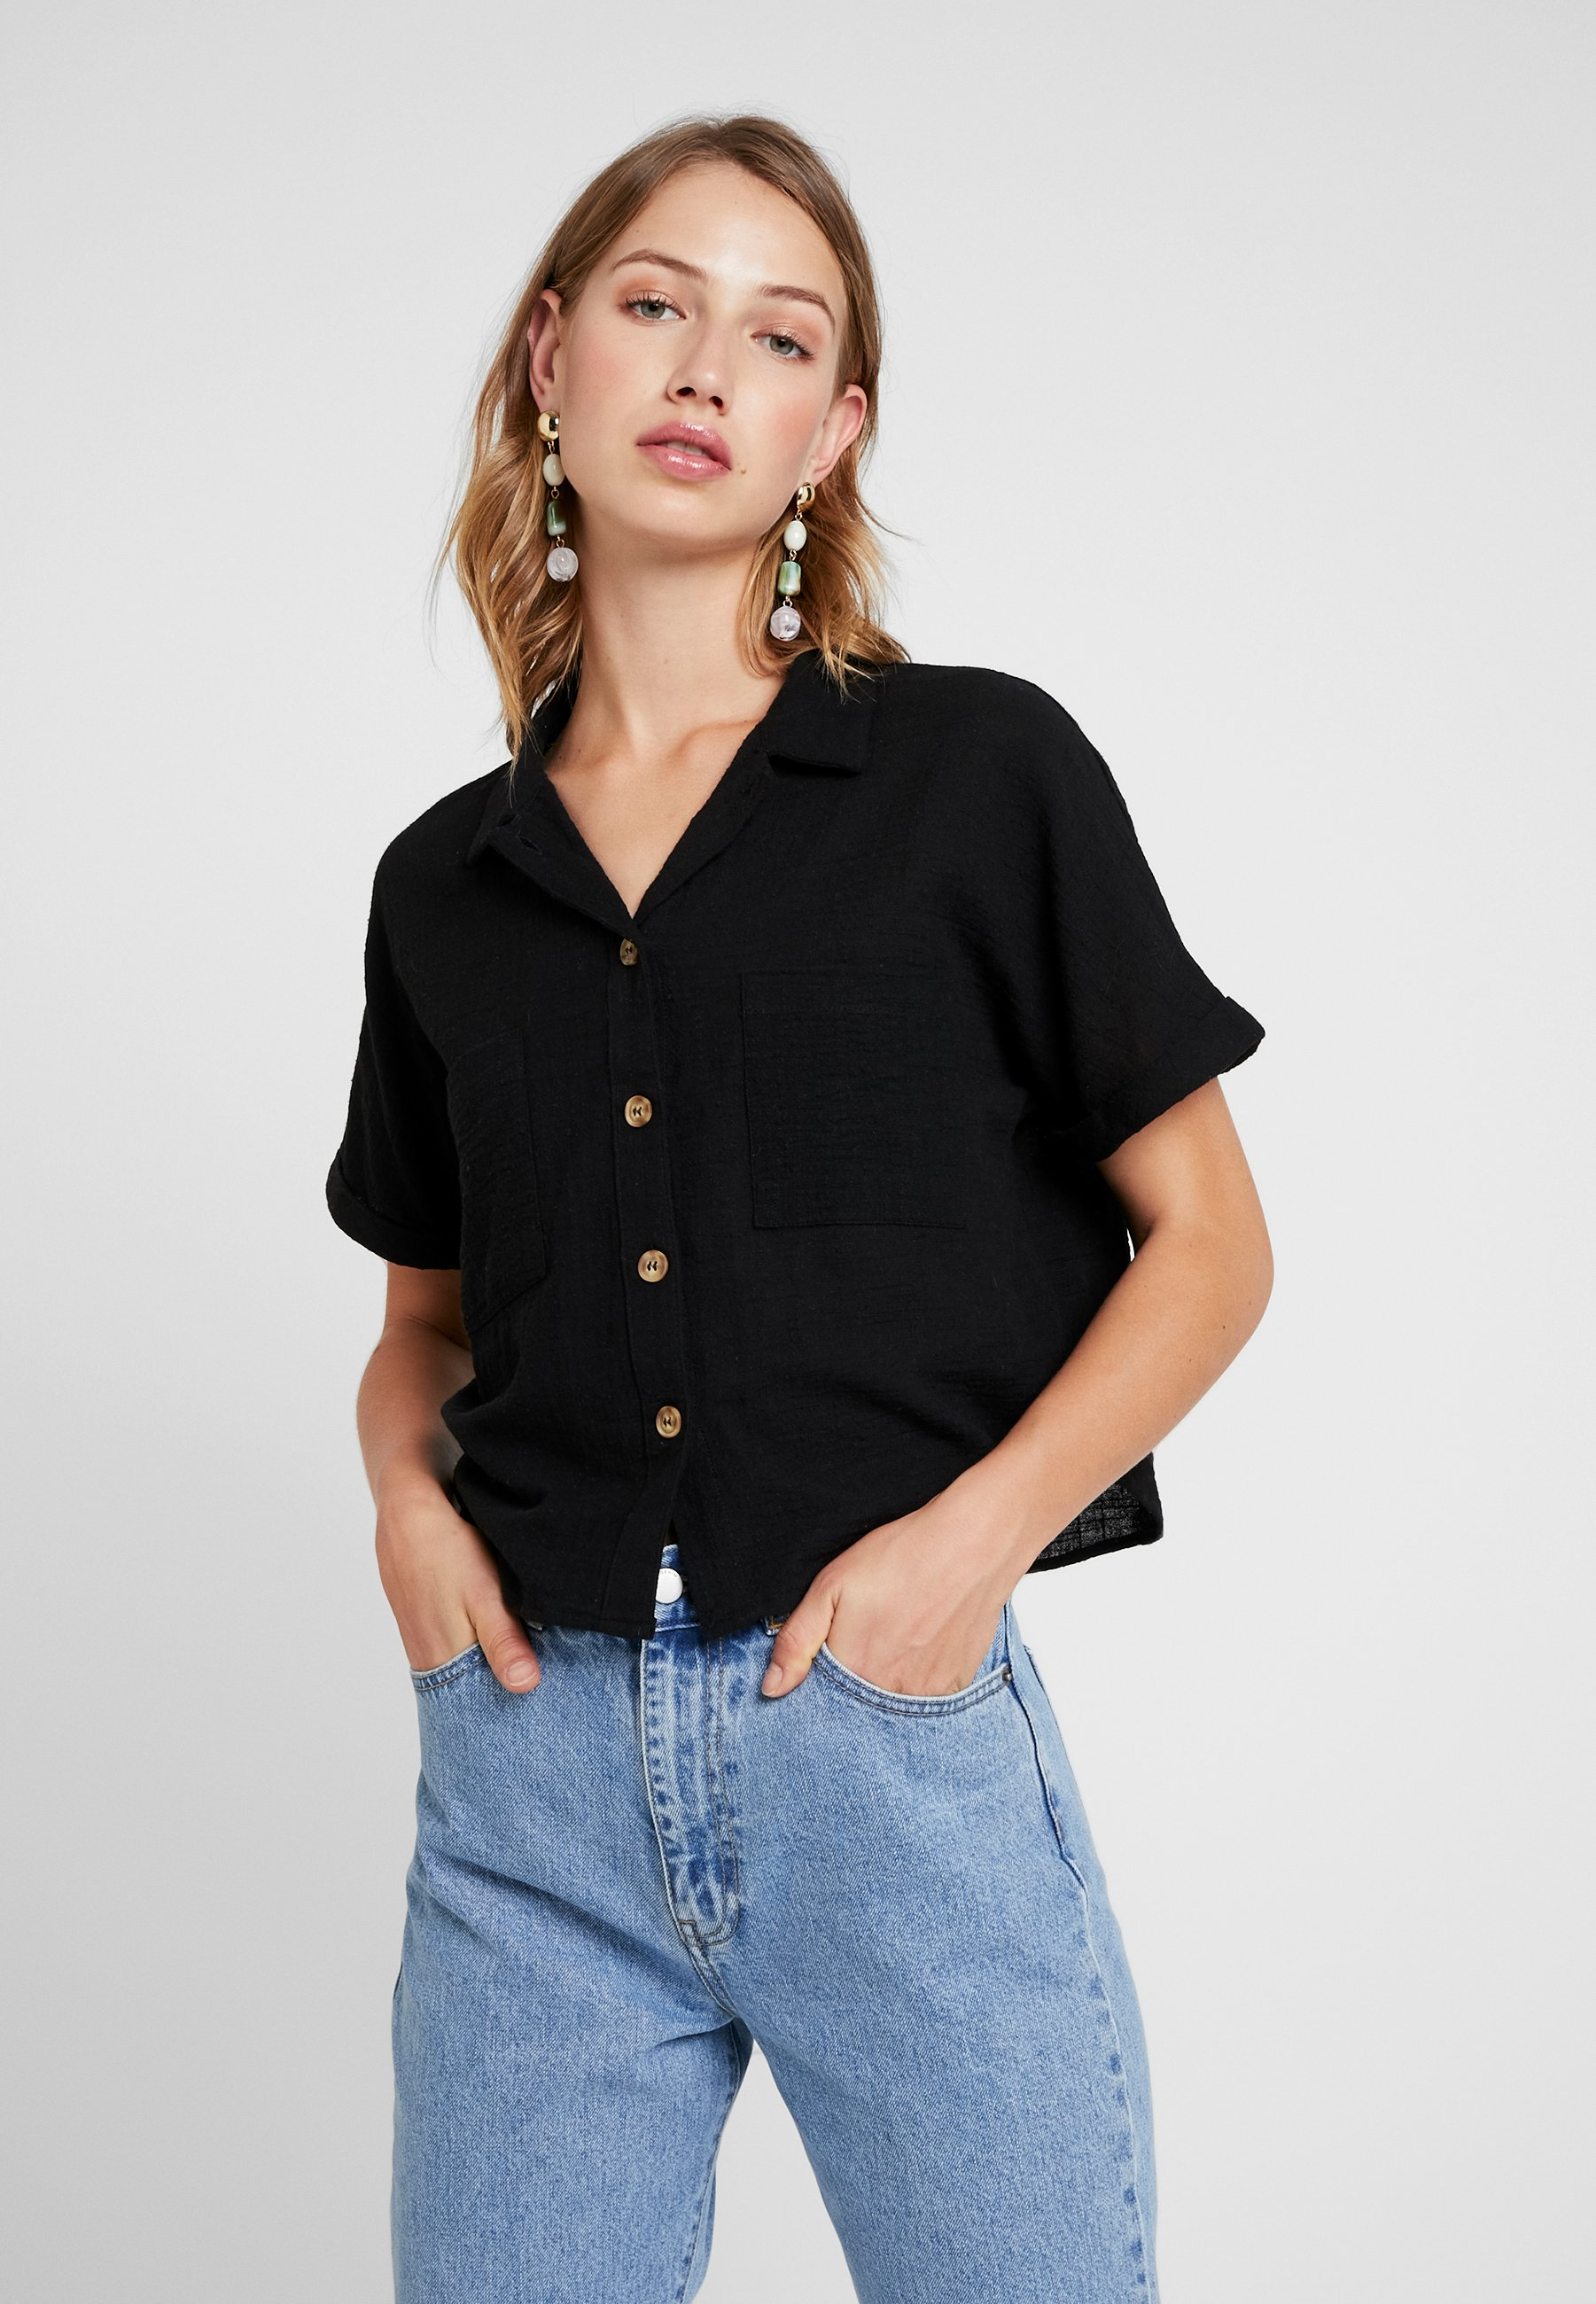 Erin SleeveChemisier Cotton On Short Black 67Yfgby